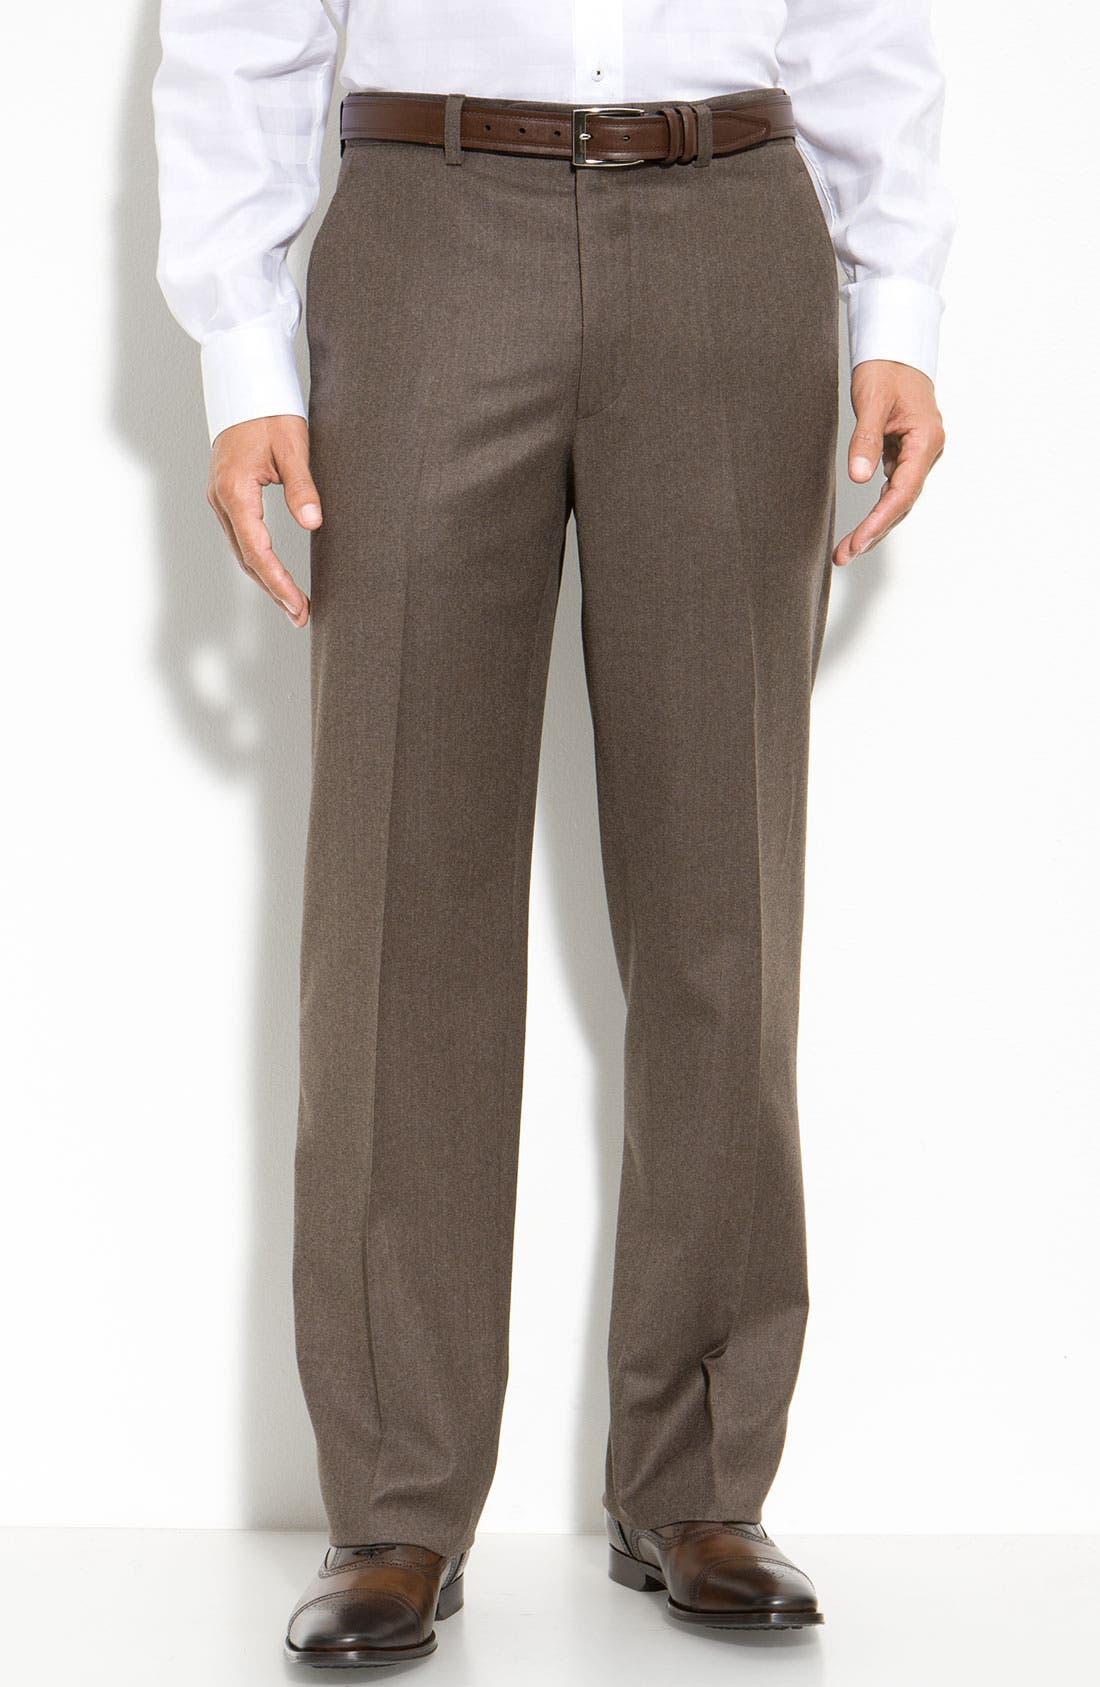 Alternate Image 1 Selected - Linea Naturale 'Hawk' Wool & Cashmere Pants